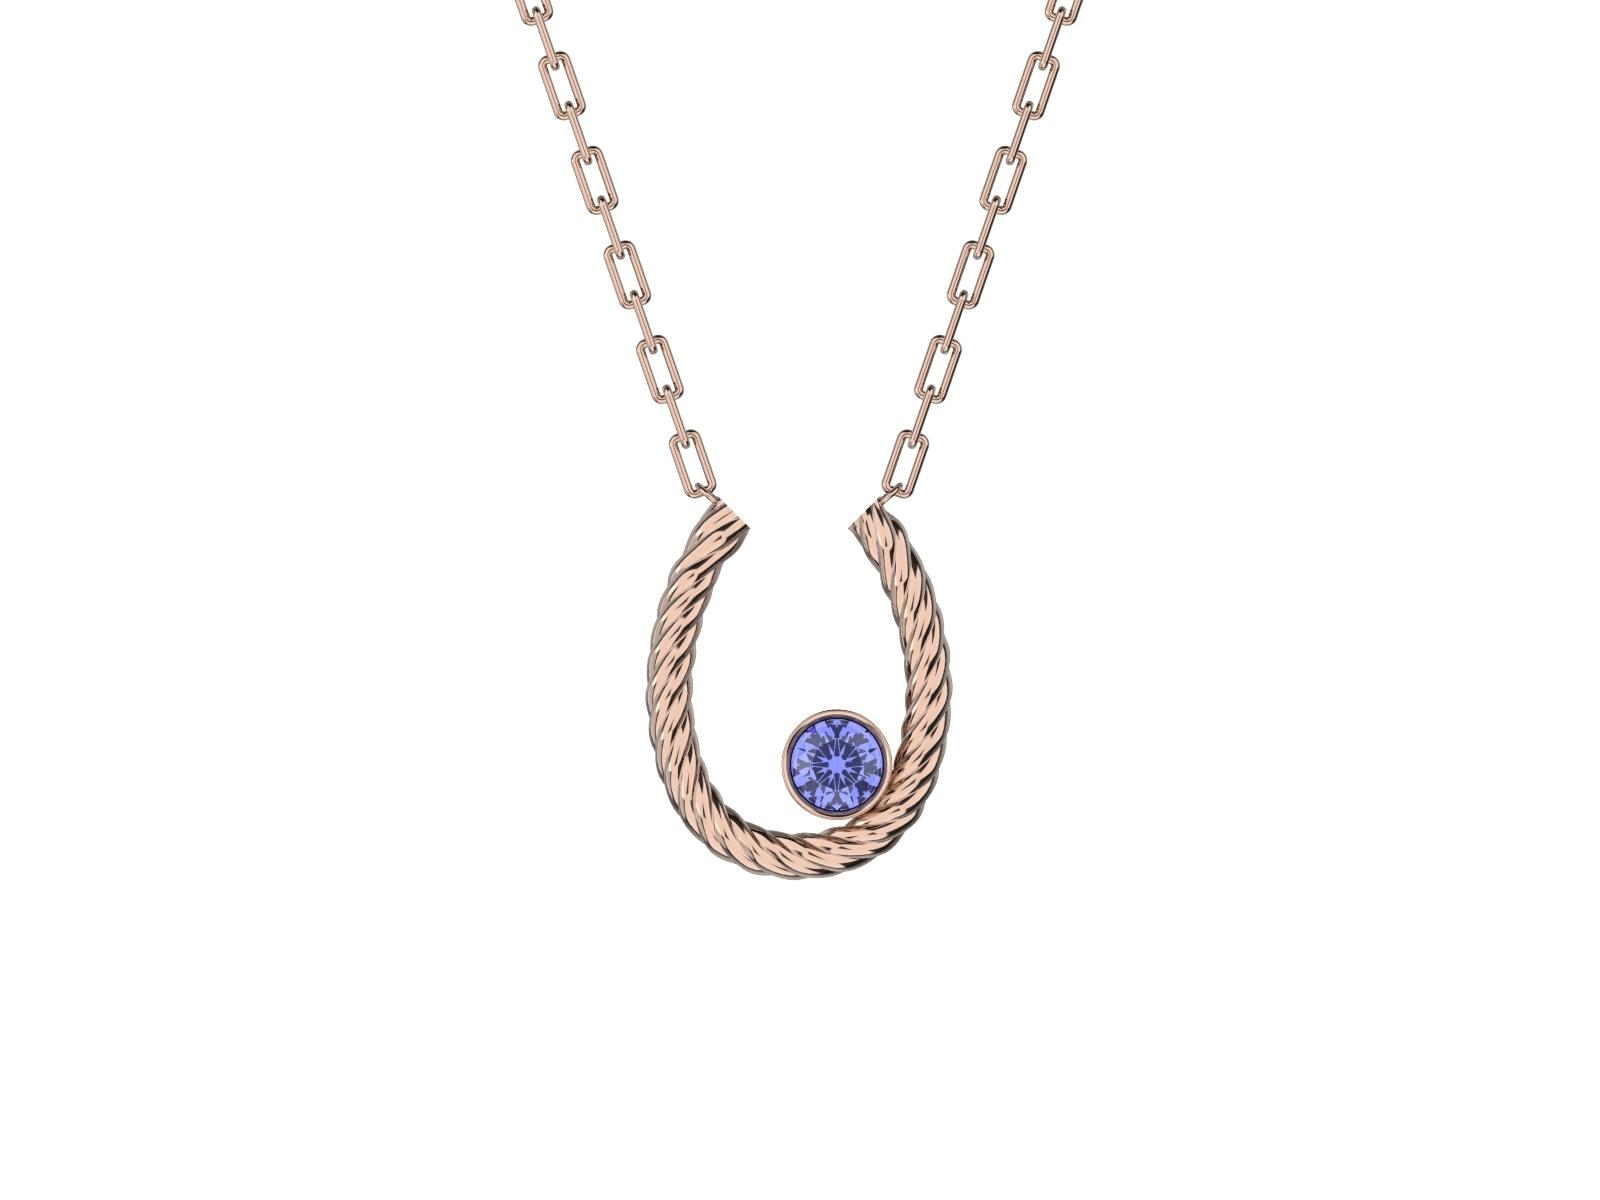 K18PG Necklace